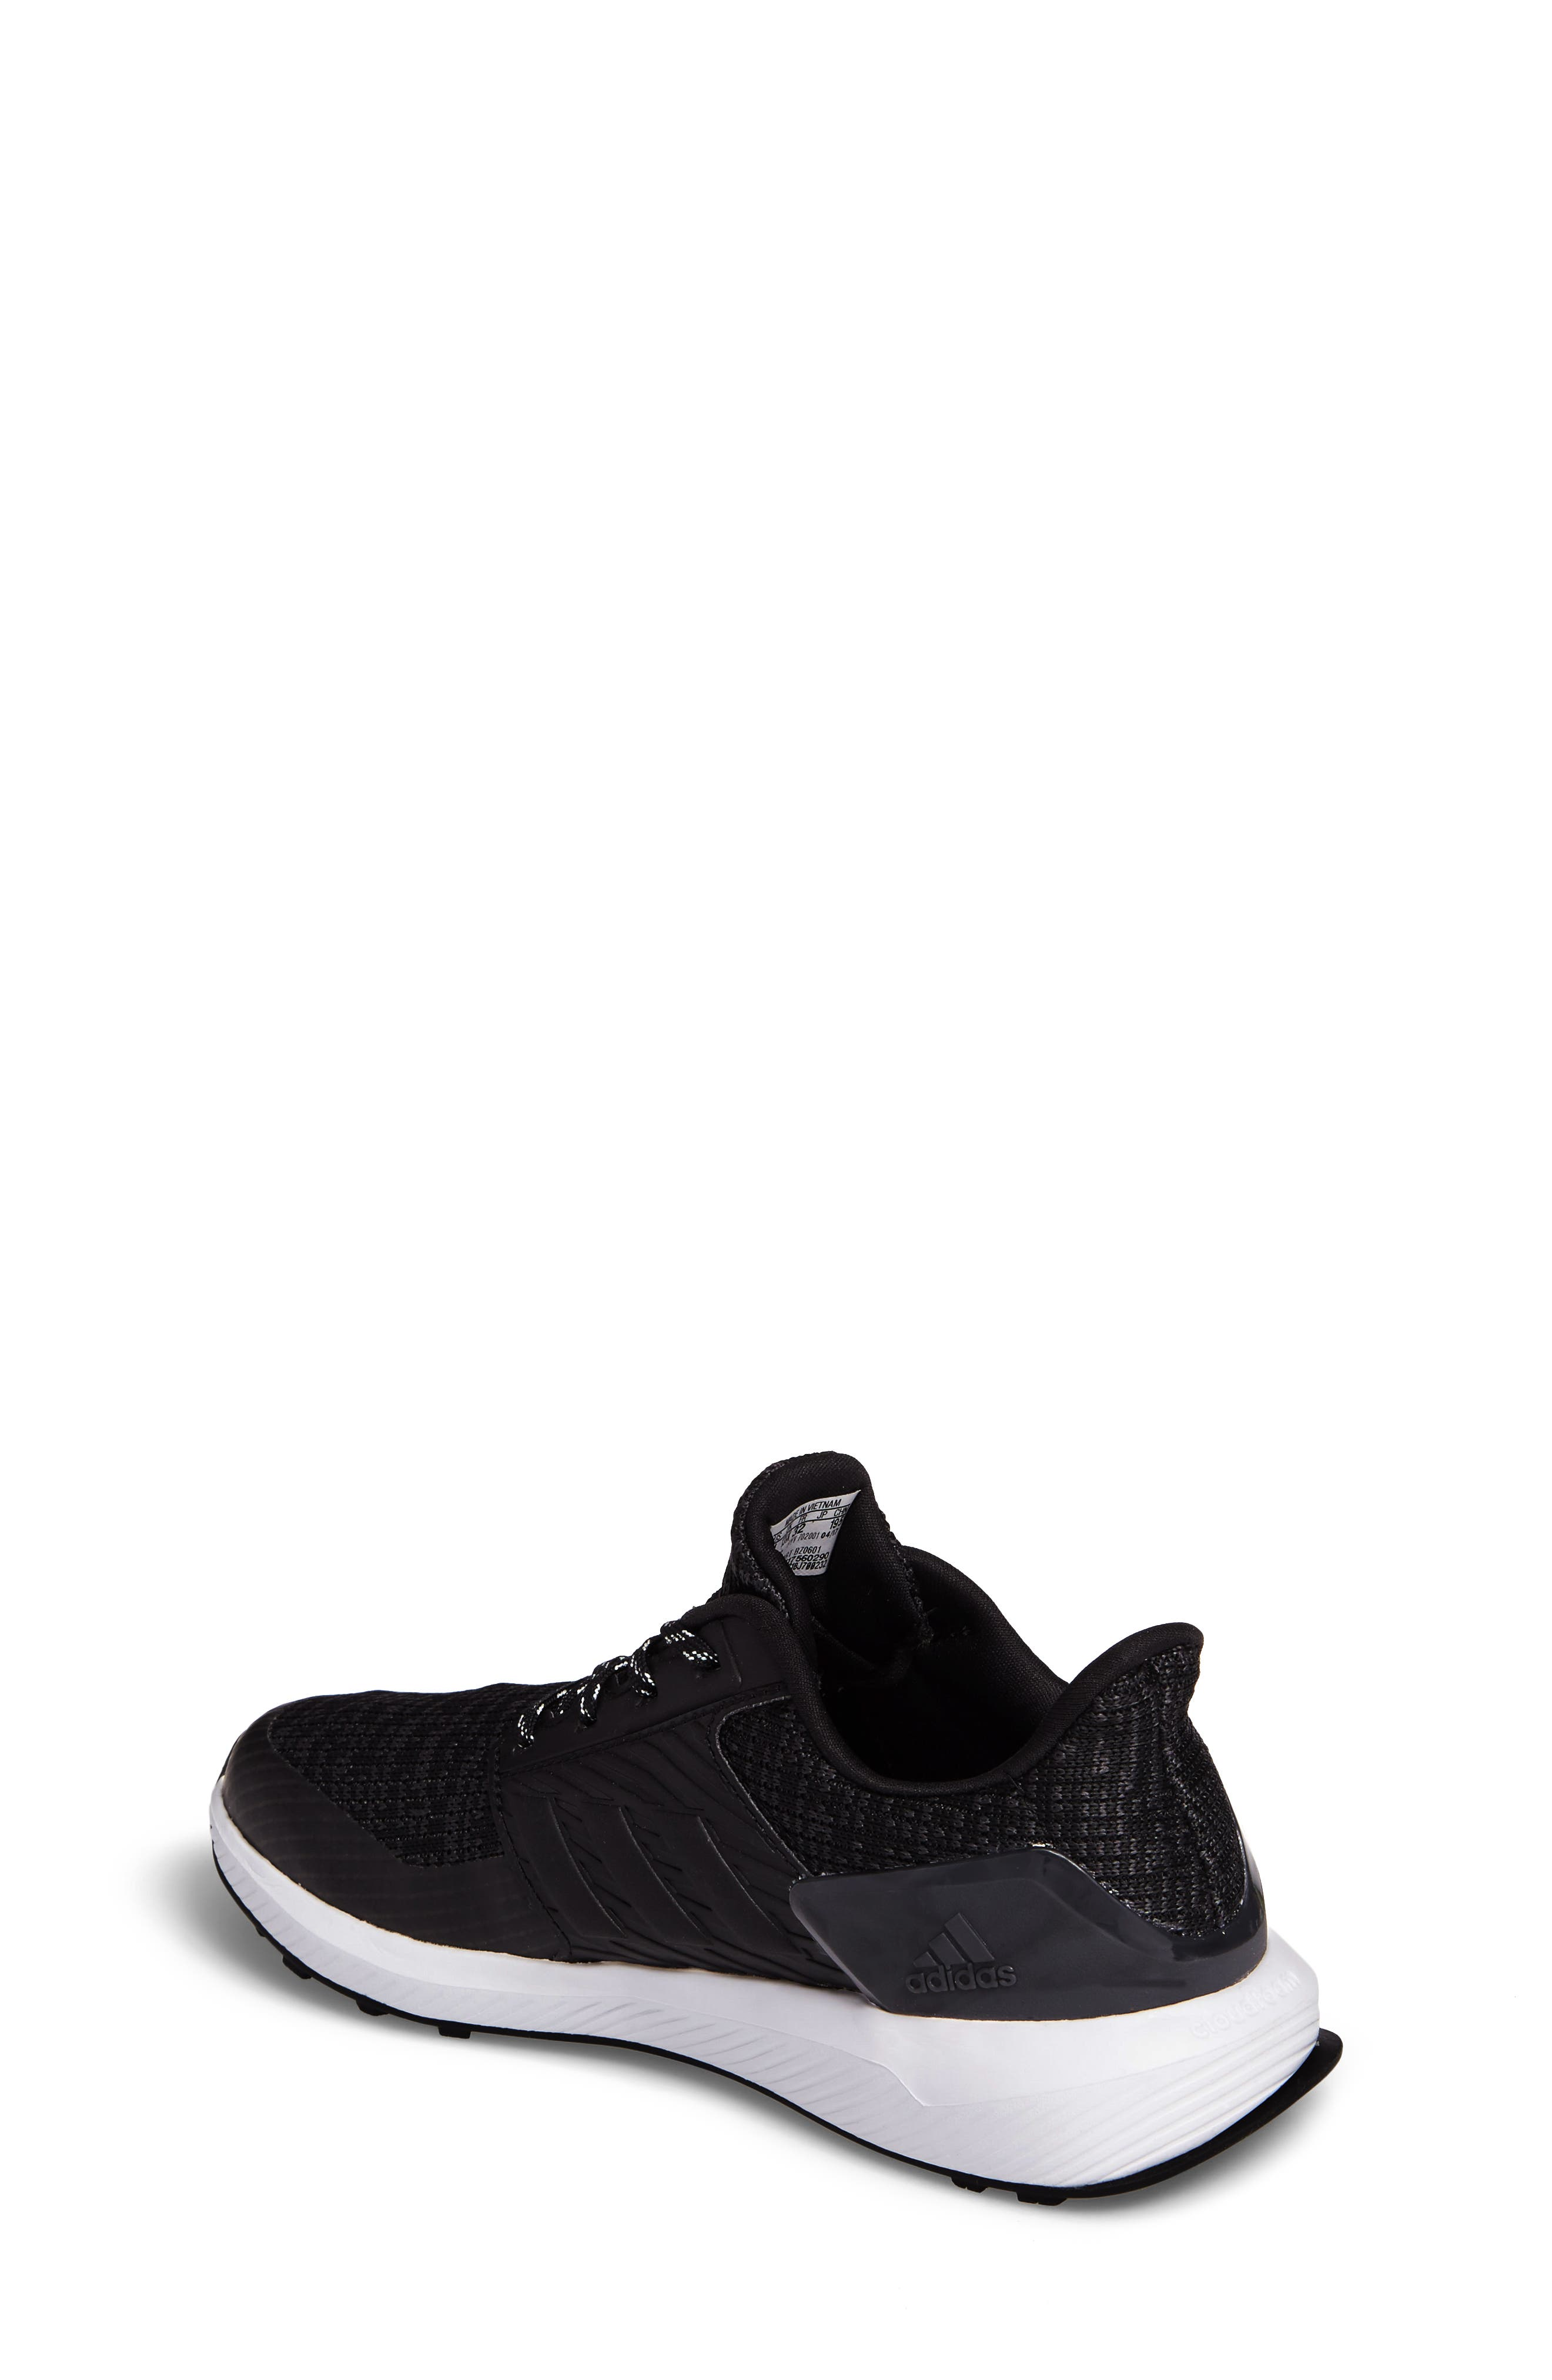 RapidaRUN Lux Sneaker,                             Alternate thumbnail 2, color,                             001